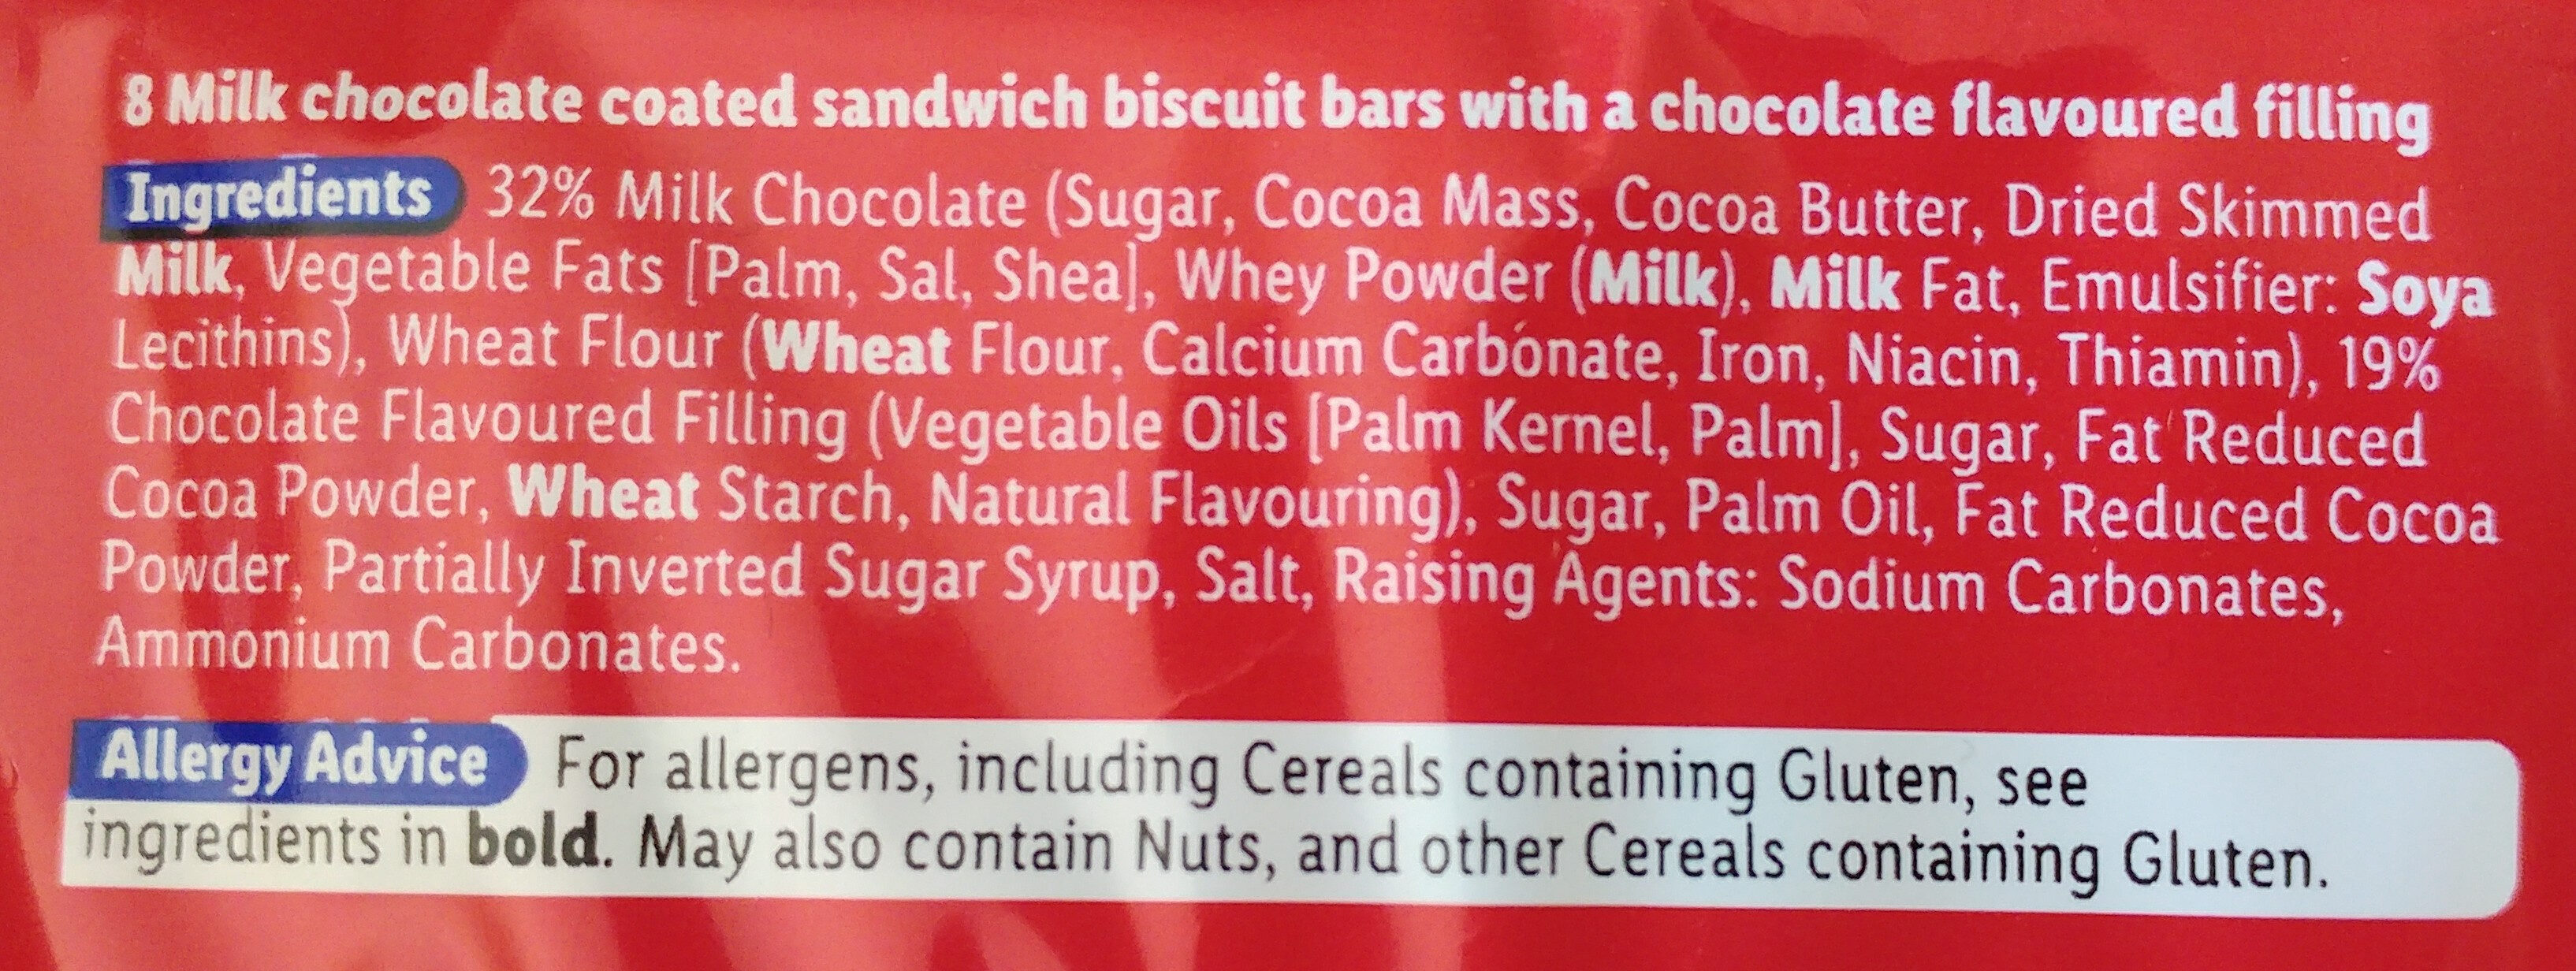 Milk Chocolate Arctic Bars - Ingredients - en